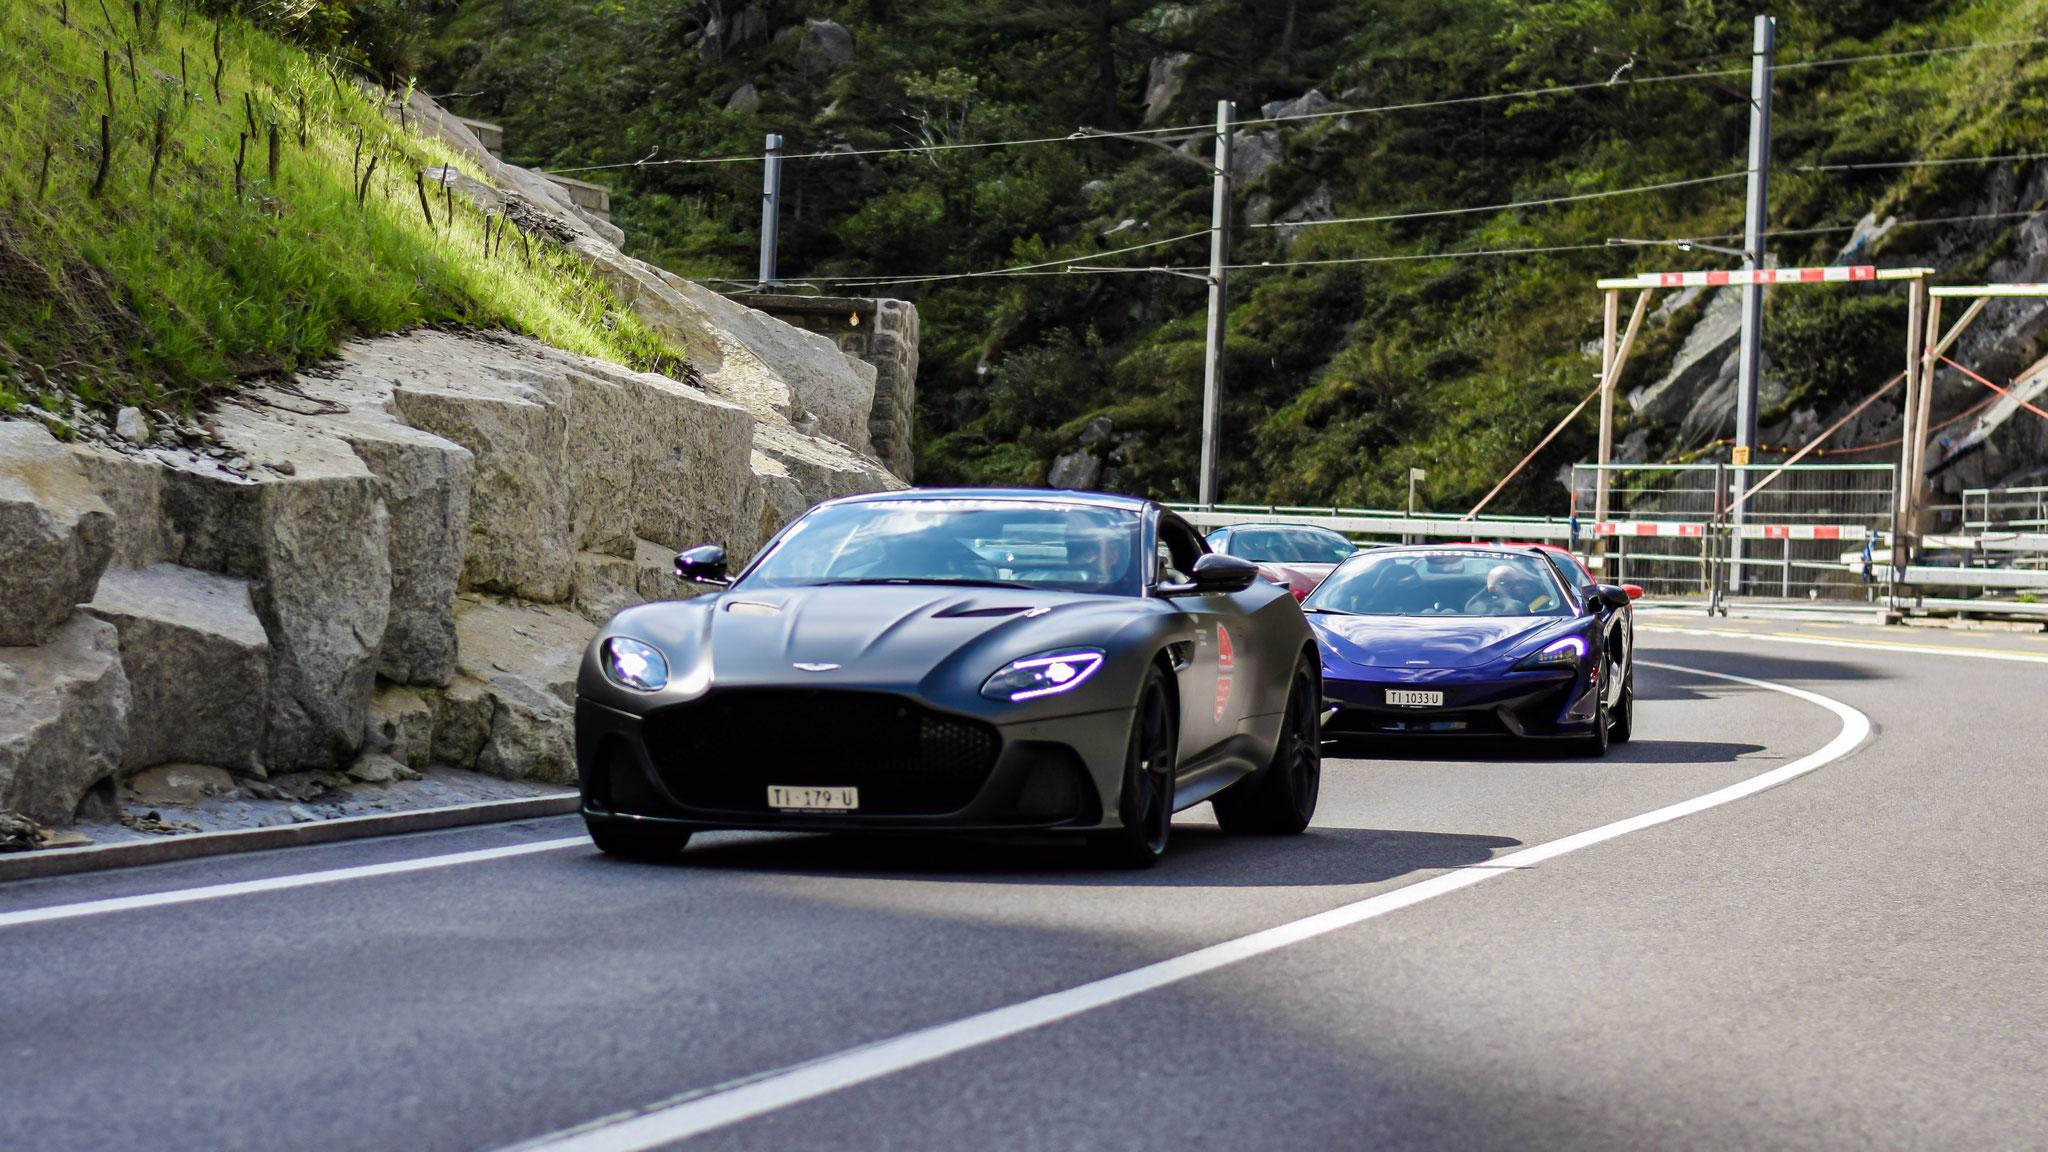 Aston Martin DBS Superleggera - TI-179-U (CH)